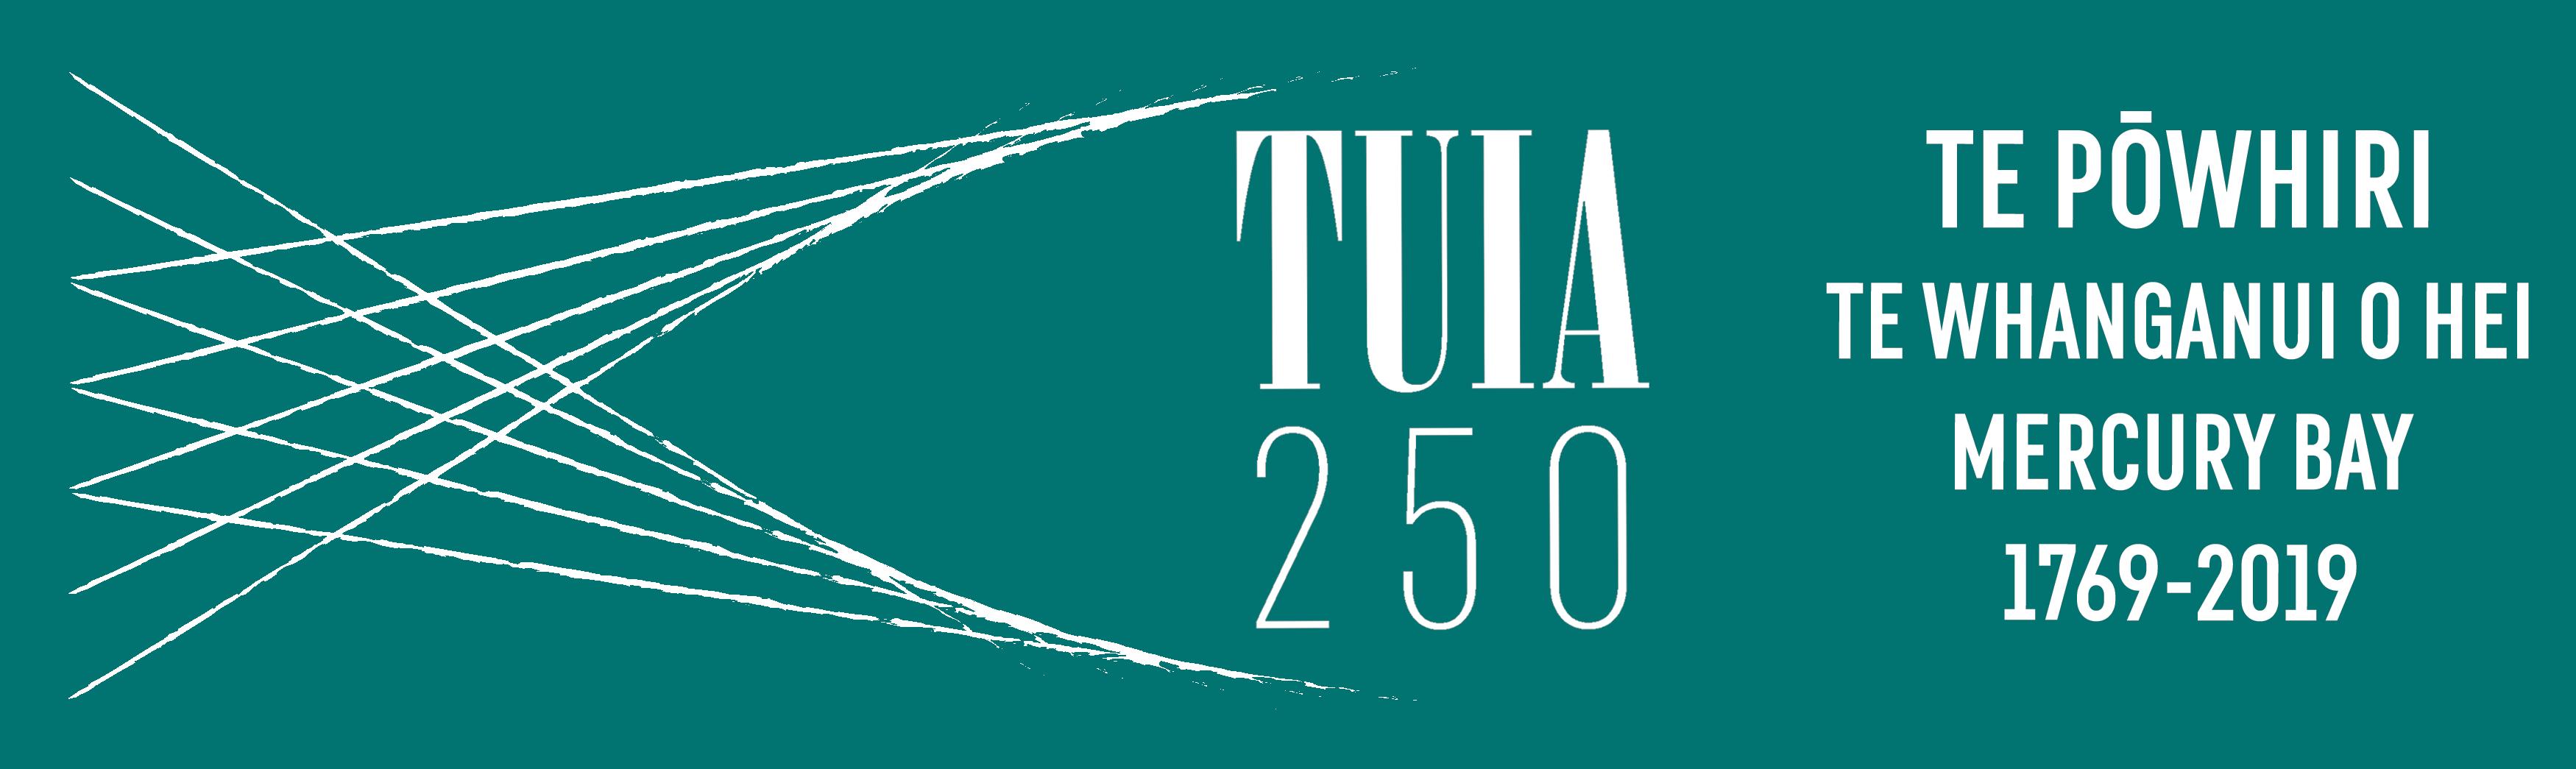 Tuia 250 Commemorations Coromandel